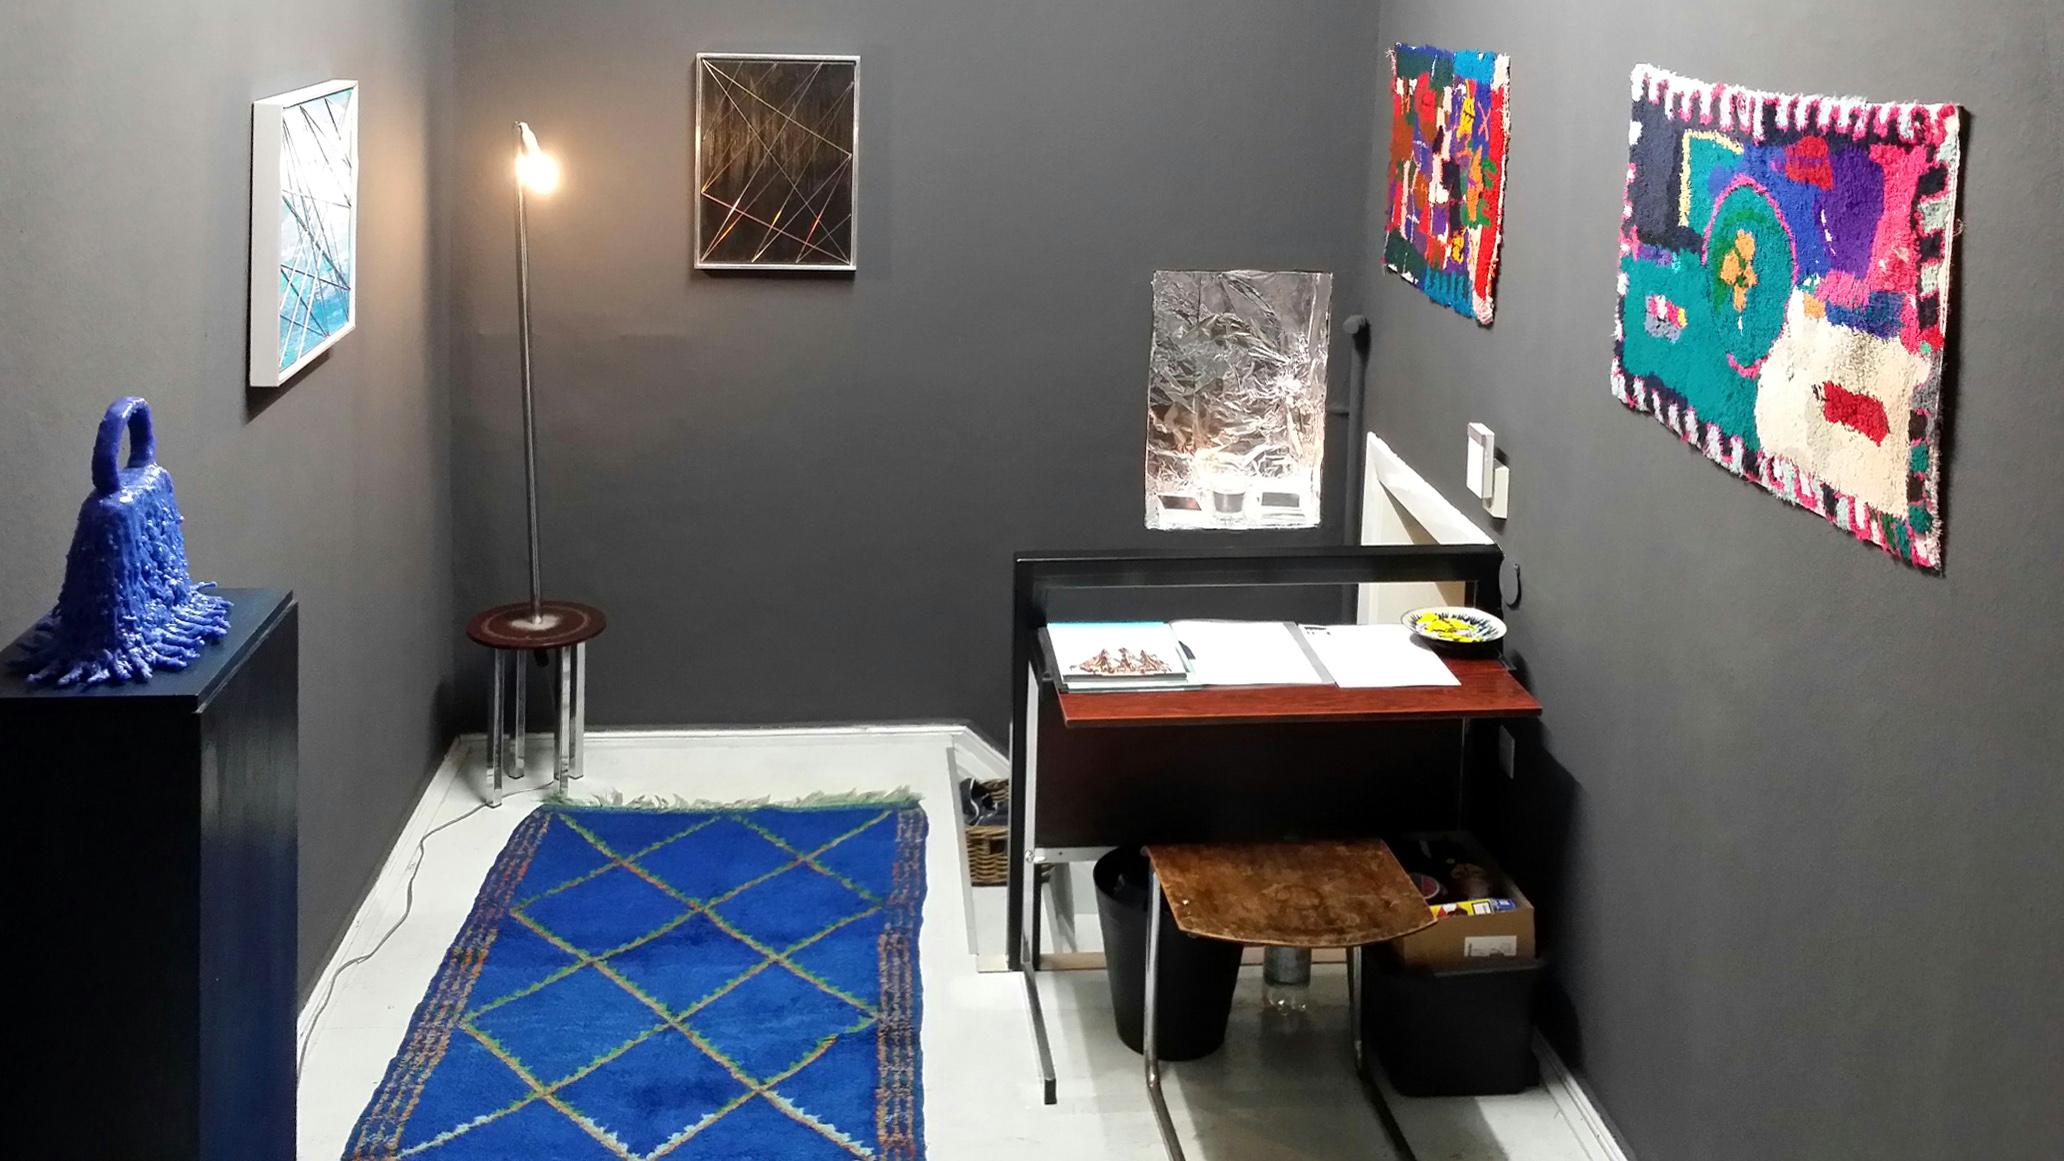 keepers lounge vol 1 11m2 berlin. Black Bedroom Furniture Sets. Home Design Ideas